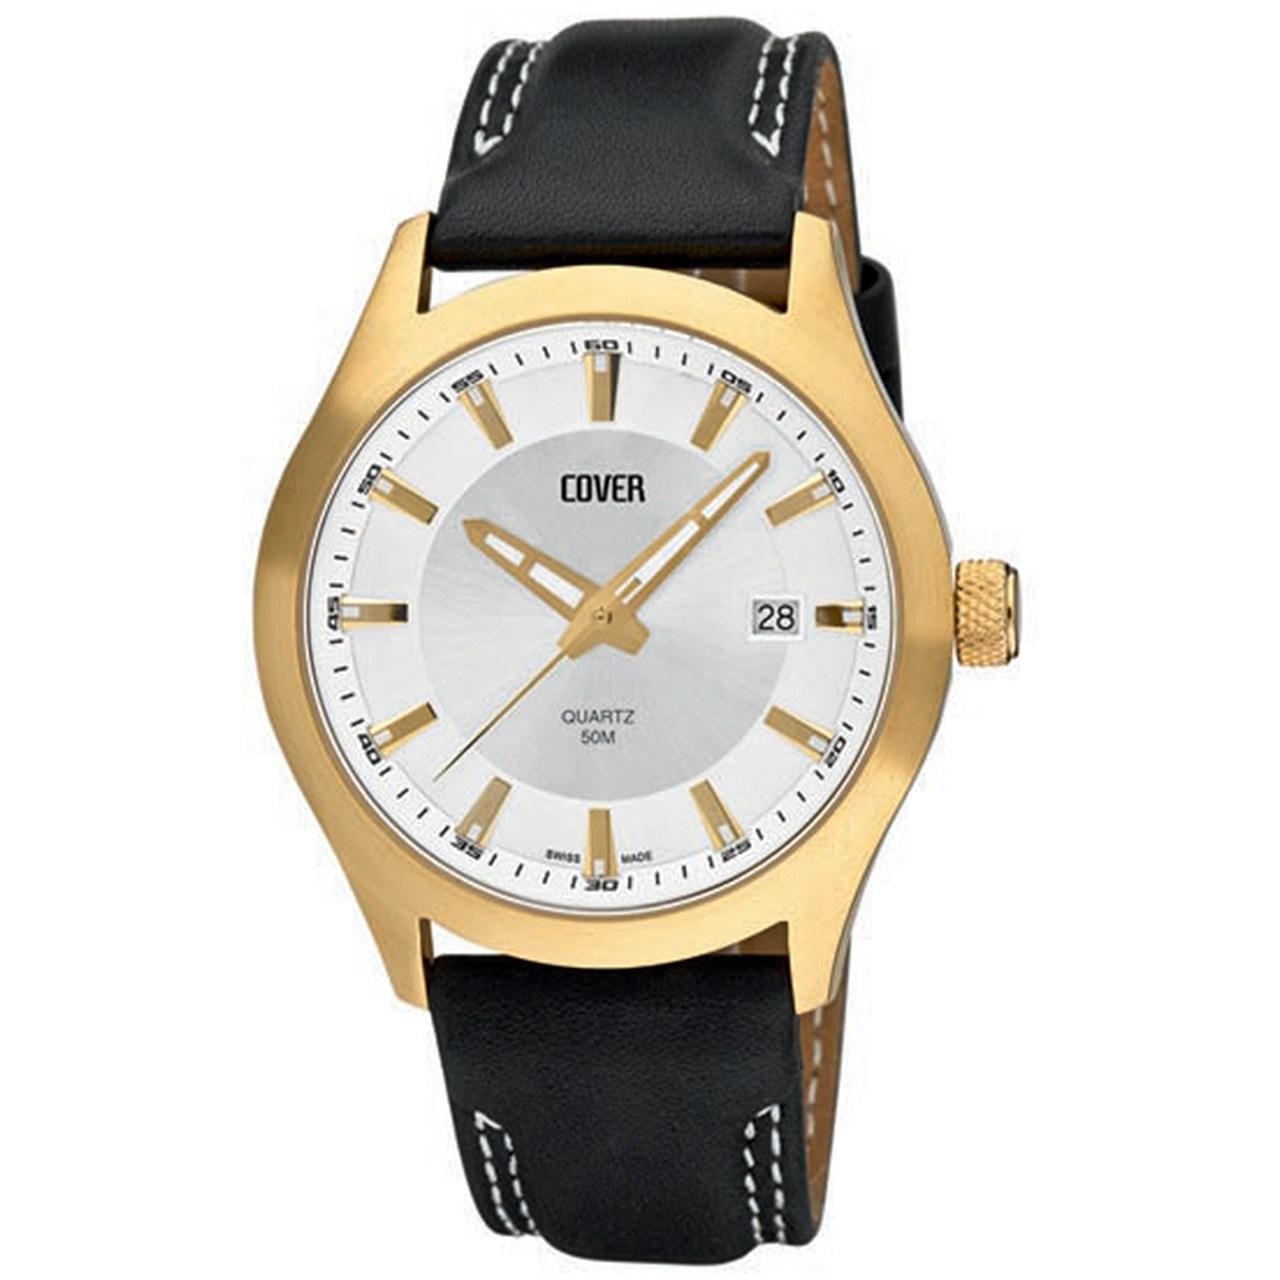 ساعت مچی عقربه ای مردانه کاور مدل Co22.PL2LBK